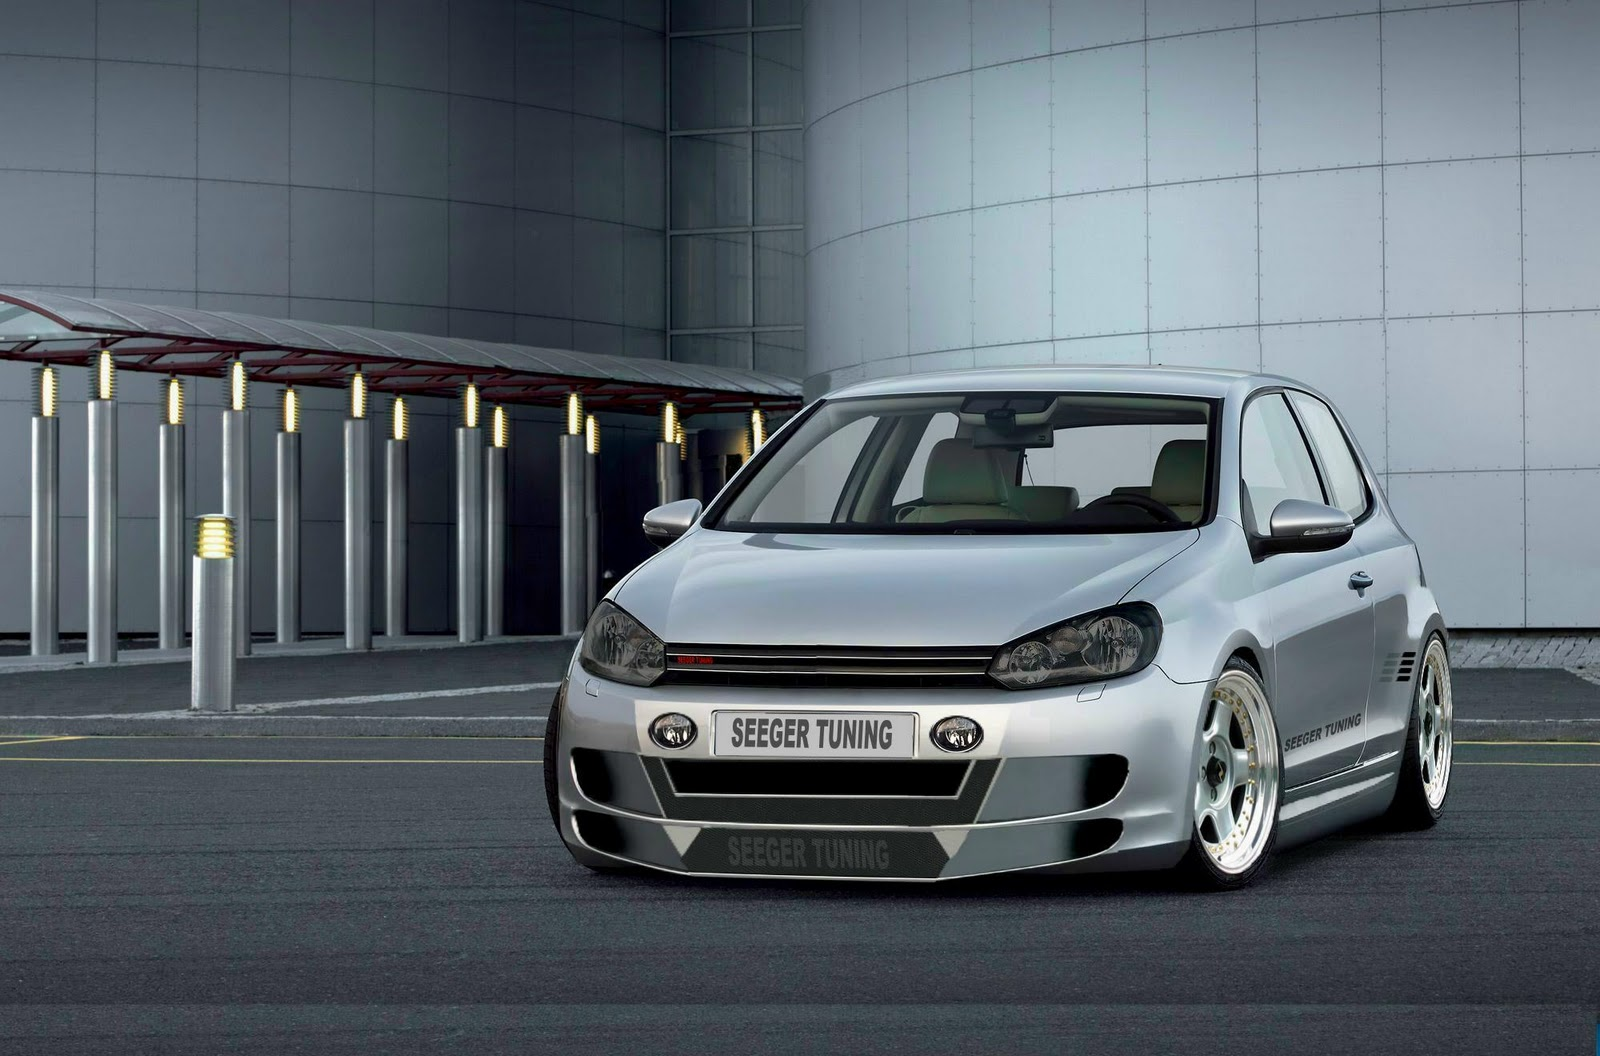 Volkswagen Golf Gti Front Tuning HD Wallpaper 1600x1056